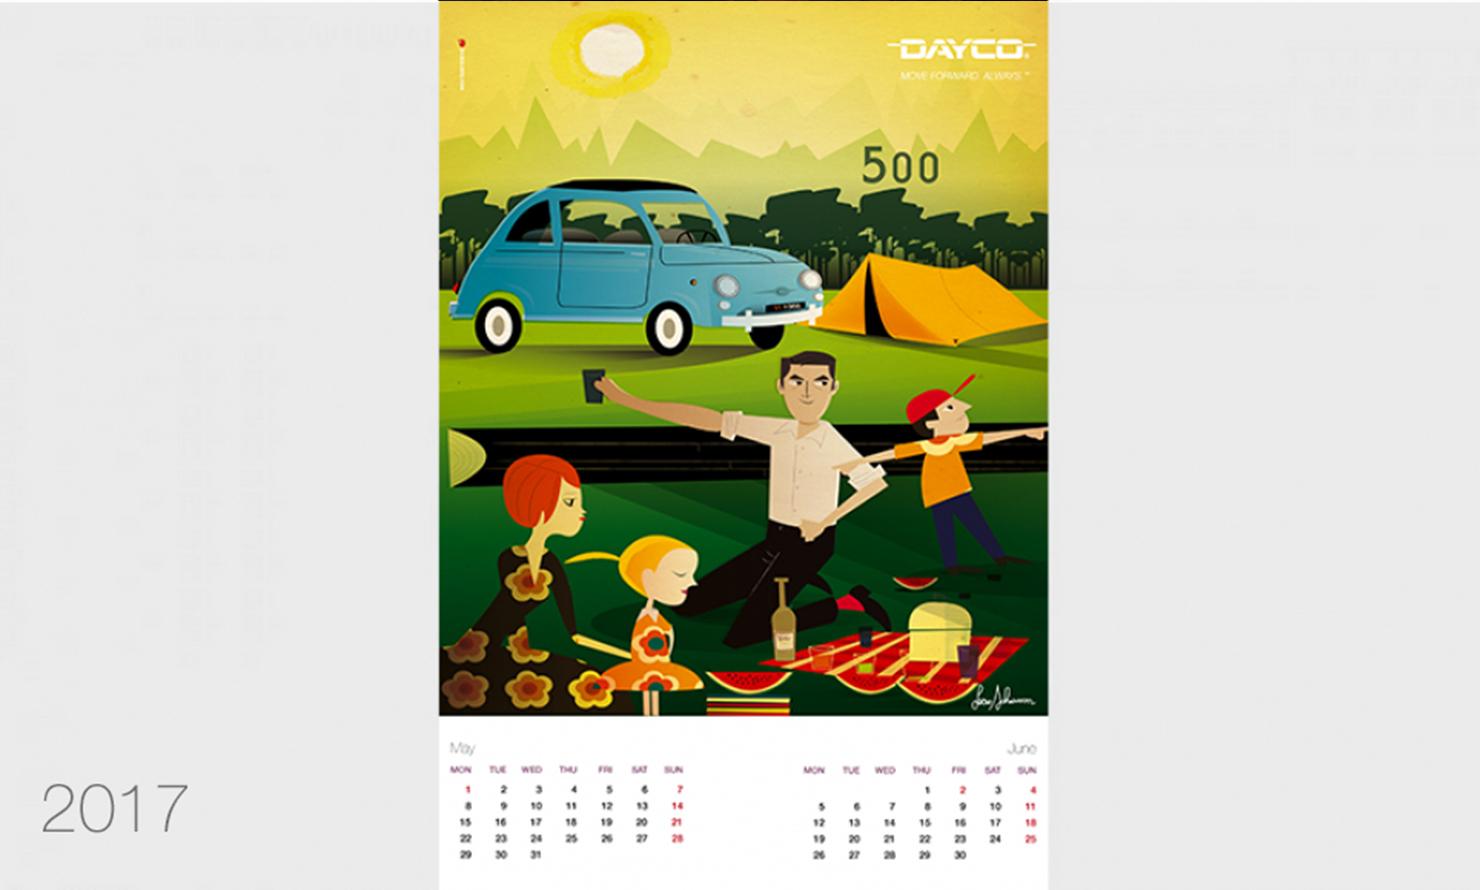 https://www.kubelibre.com/uploads/Slider-work-tutti-clienti/dayco-calendario-2017-3.jpg